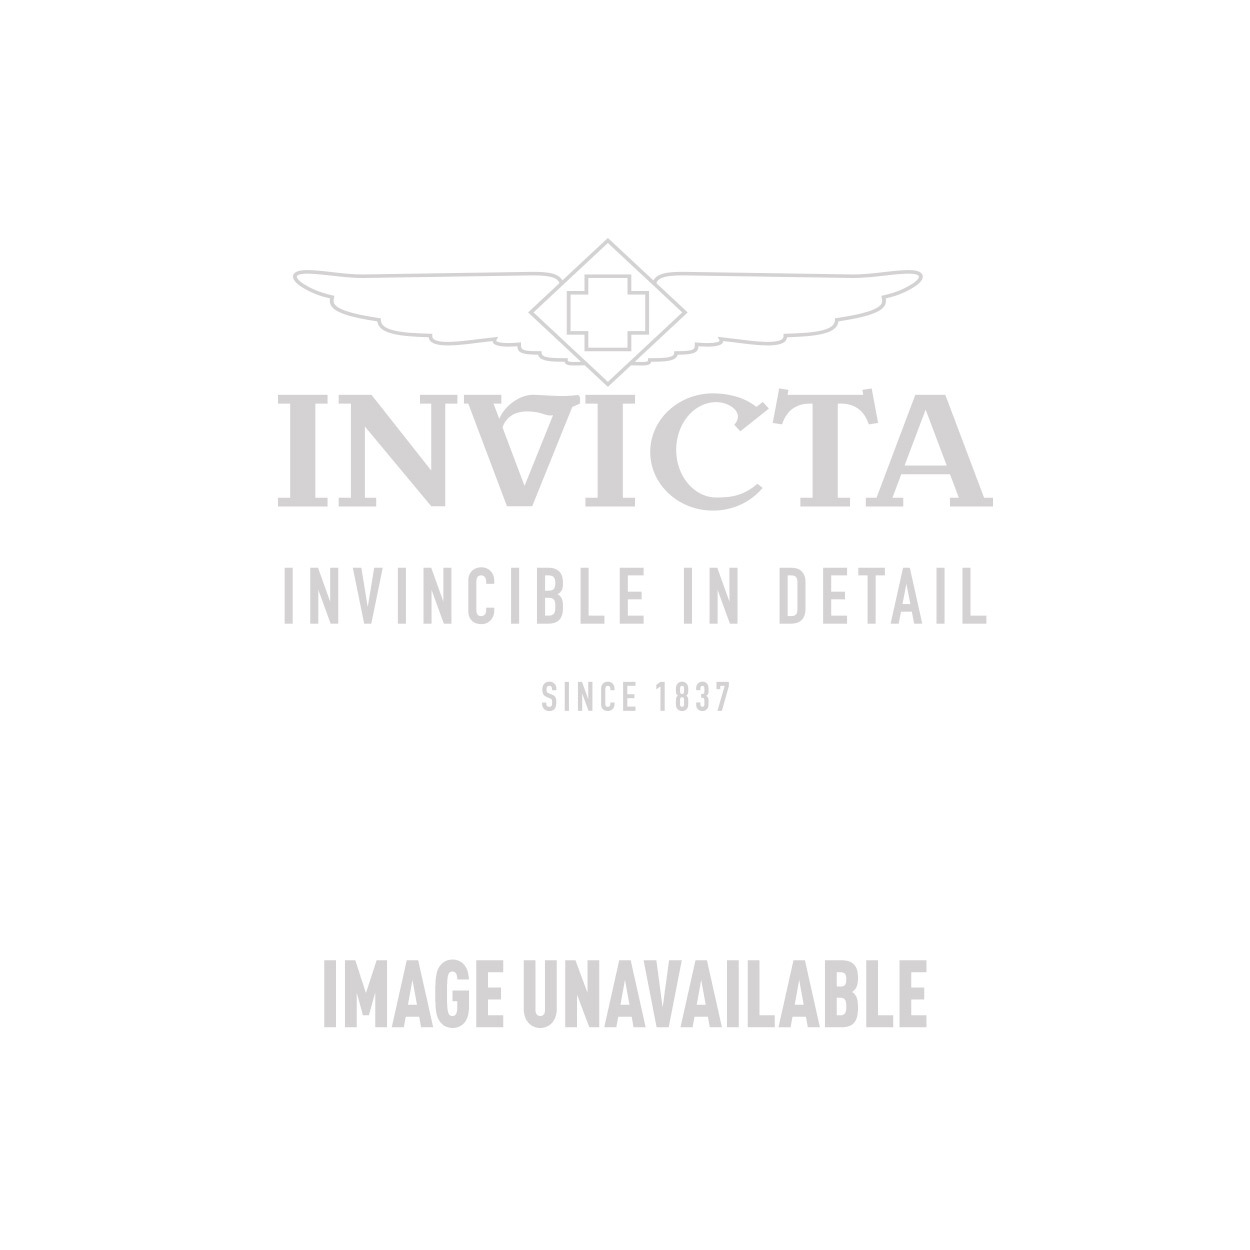 Invicta Corduba Swiss Movement Quartz Watch - Gold case with Blue tone Polyurethane band - Model 18834